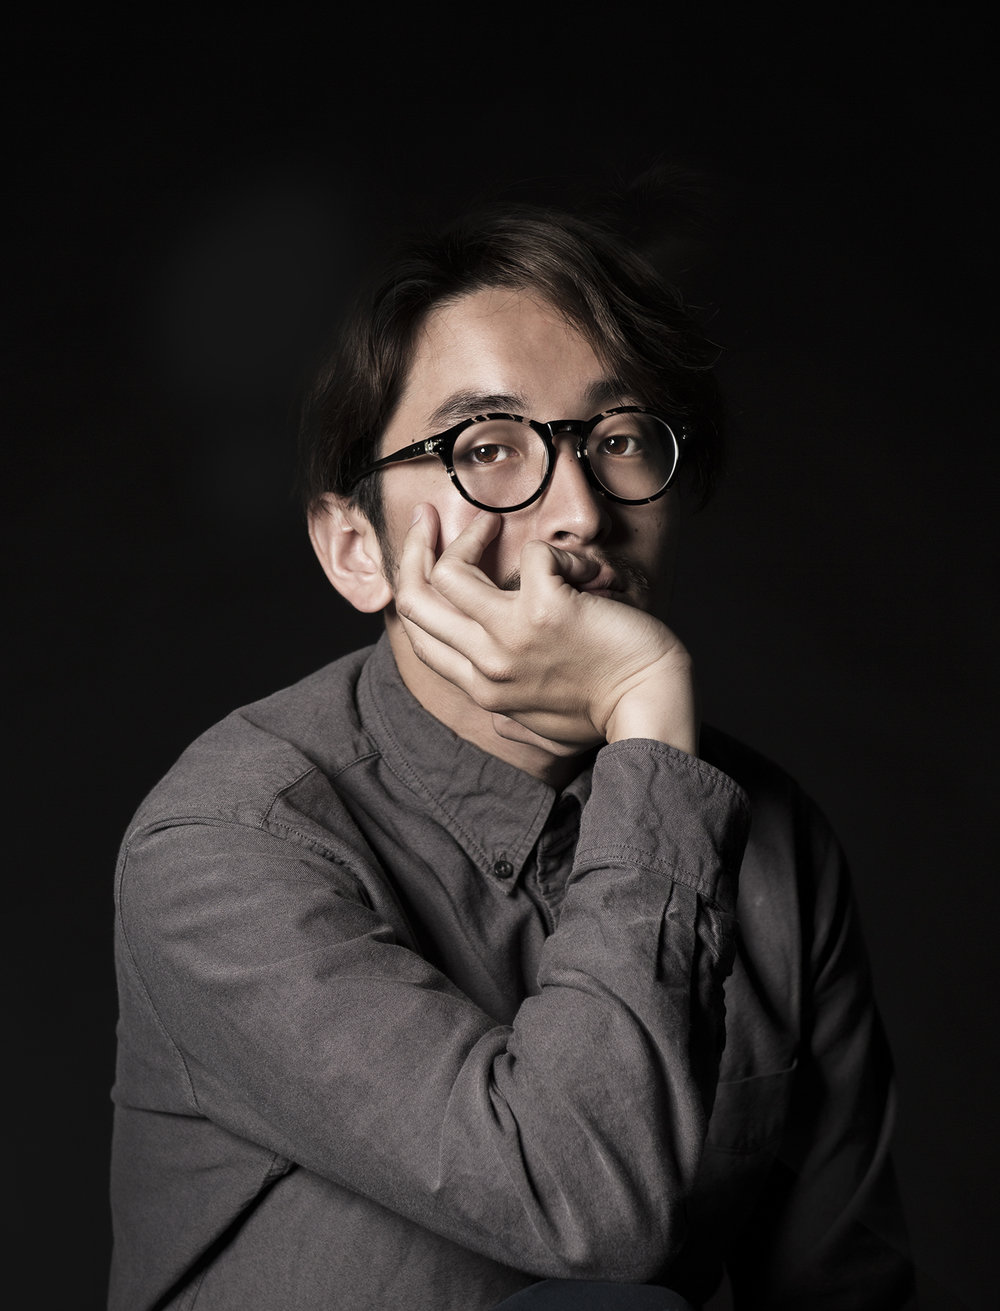 Longbin Li, graphic designer and graduate of Glasgow School of Art